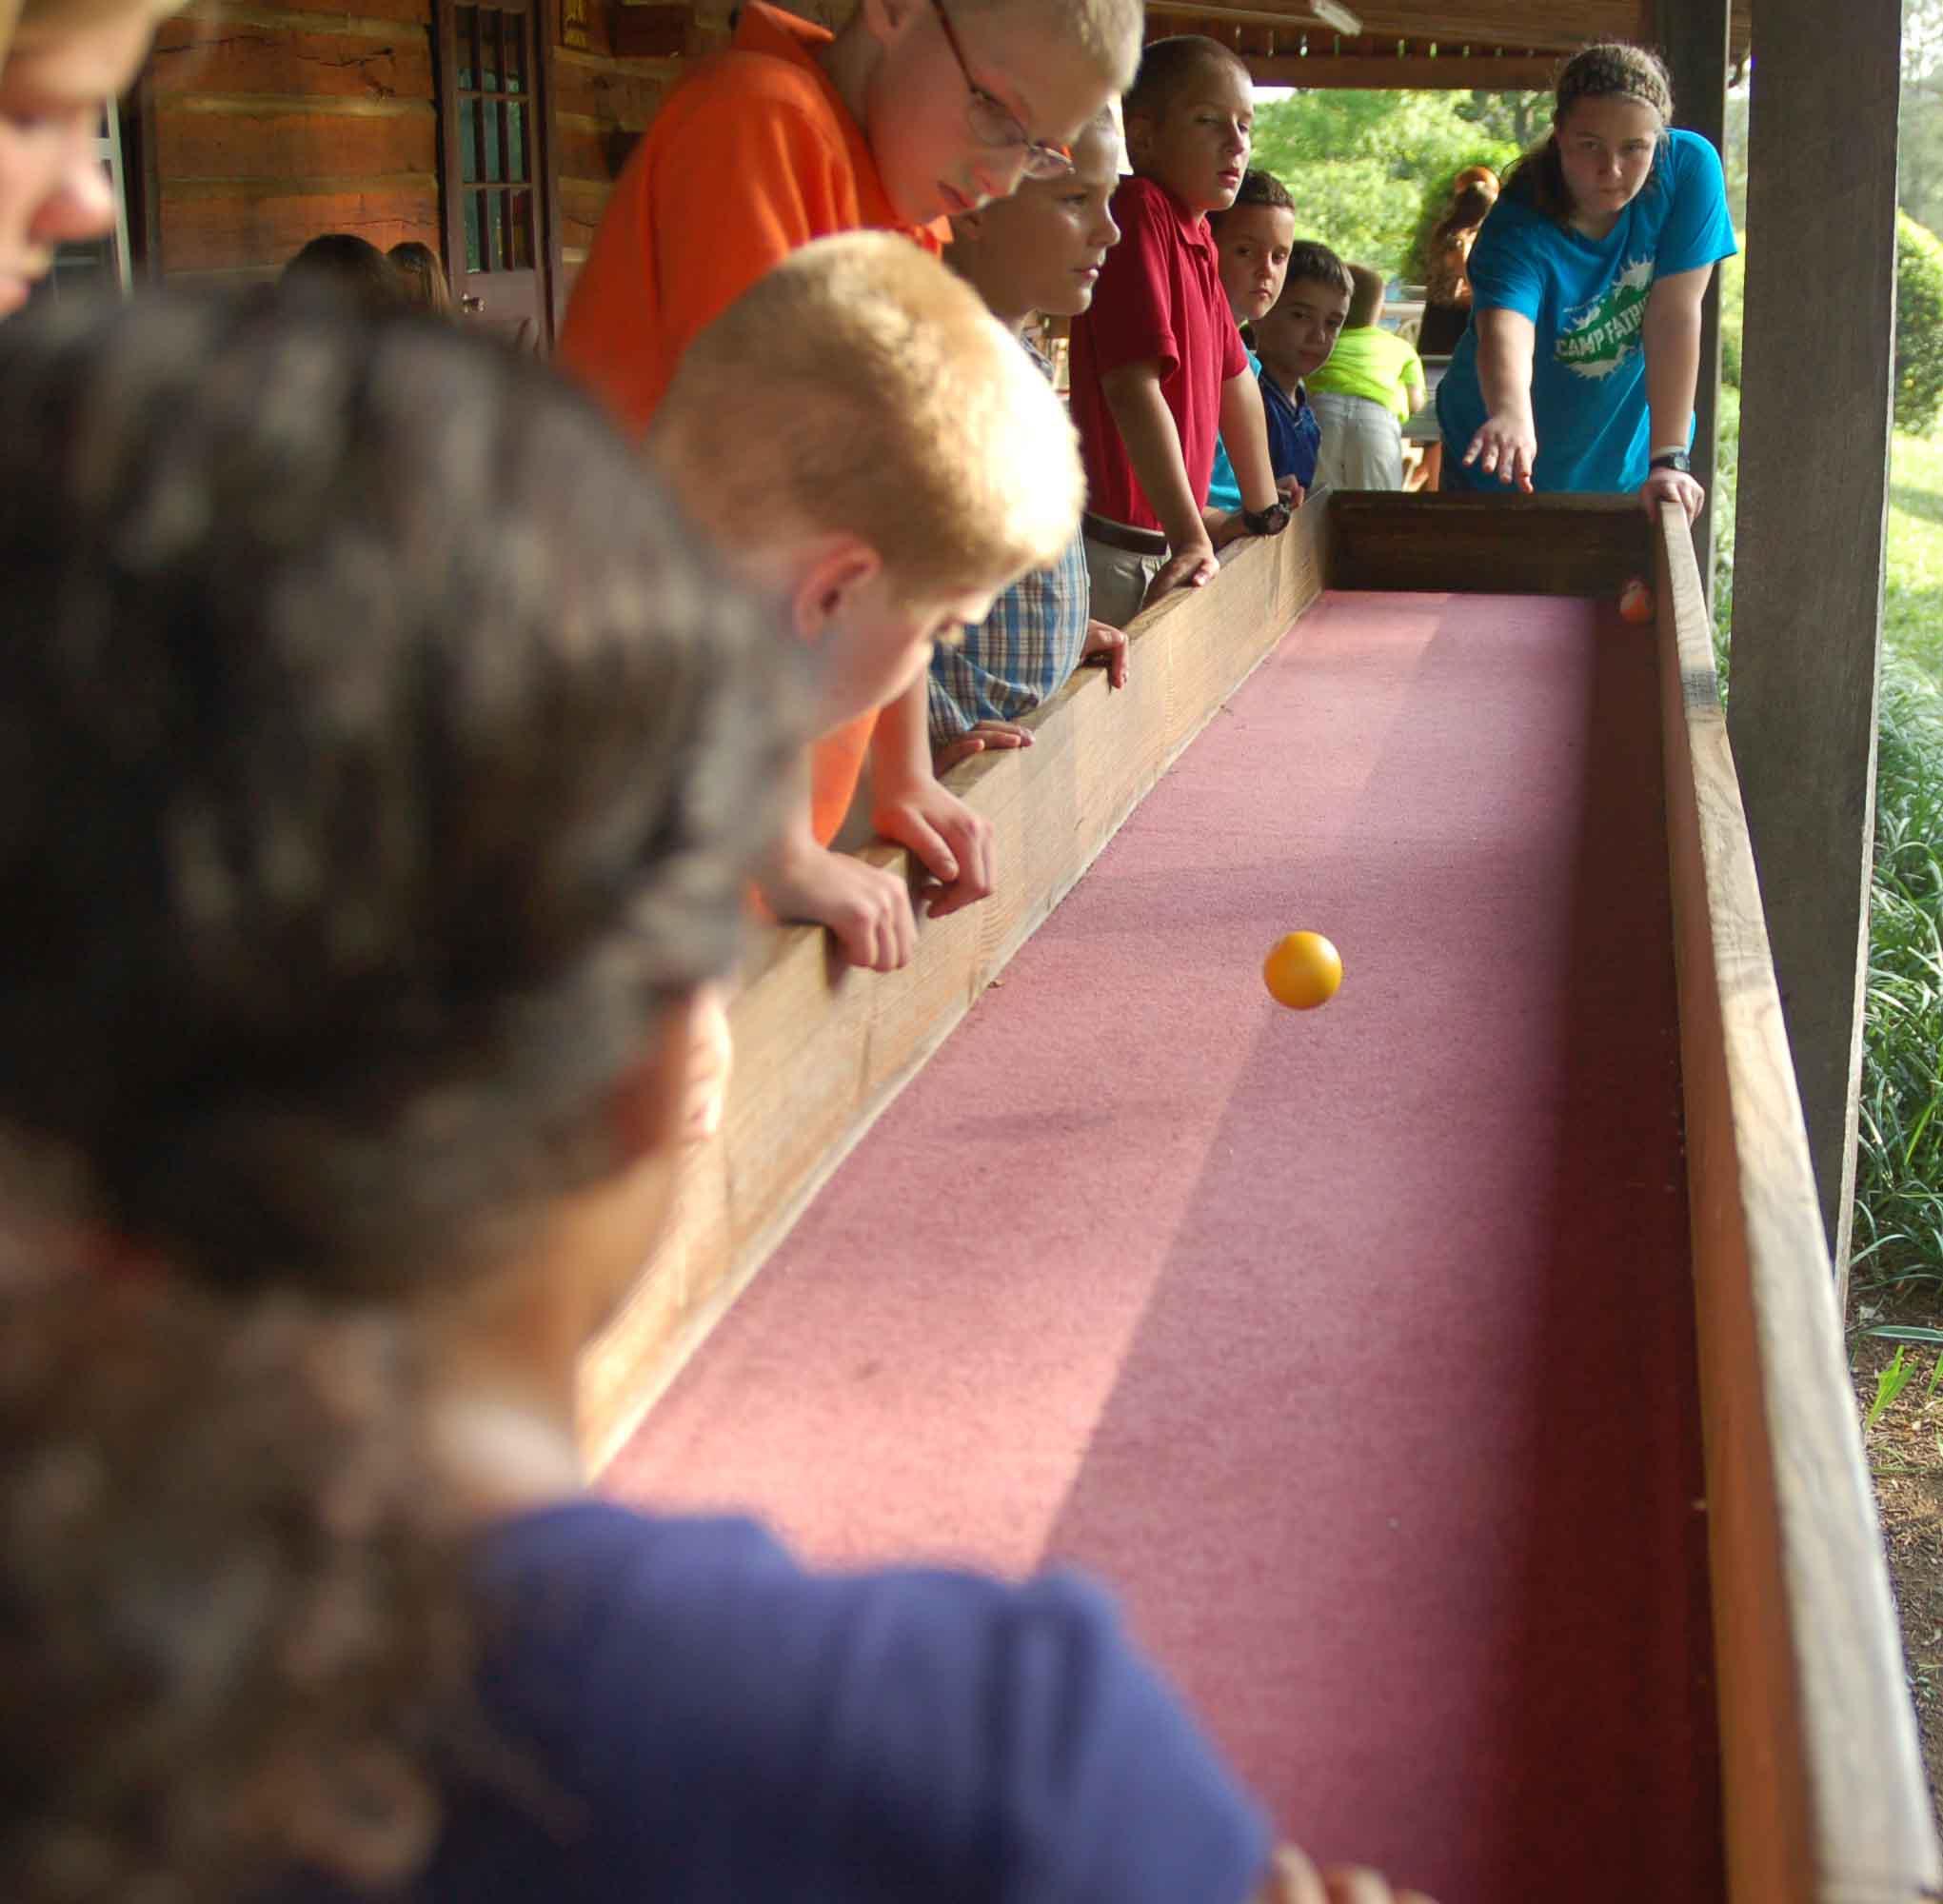 camp fairview carpet ball - Carpet Ball Table